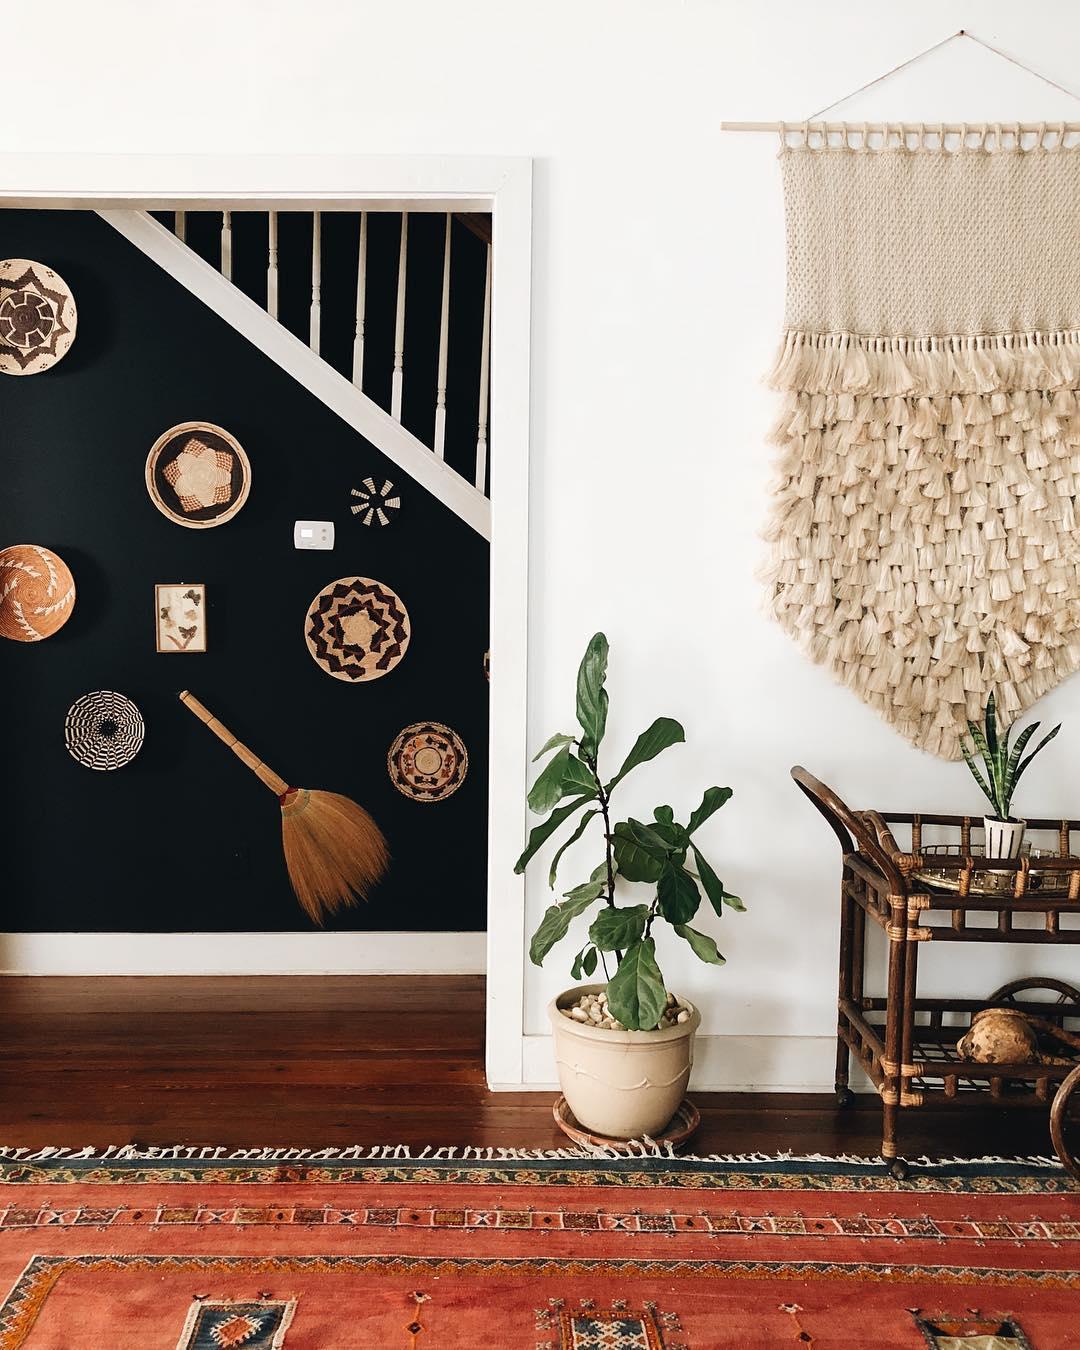 Macrame Installation by Modern Macramé by Emily Katz, Macrame Wall Hanging at Private Residence, Atlanta, GA